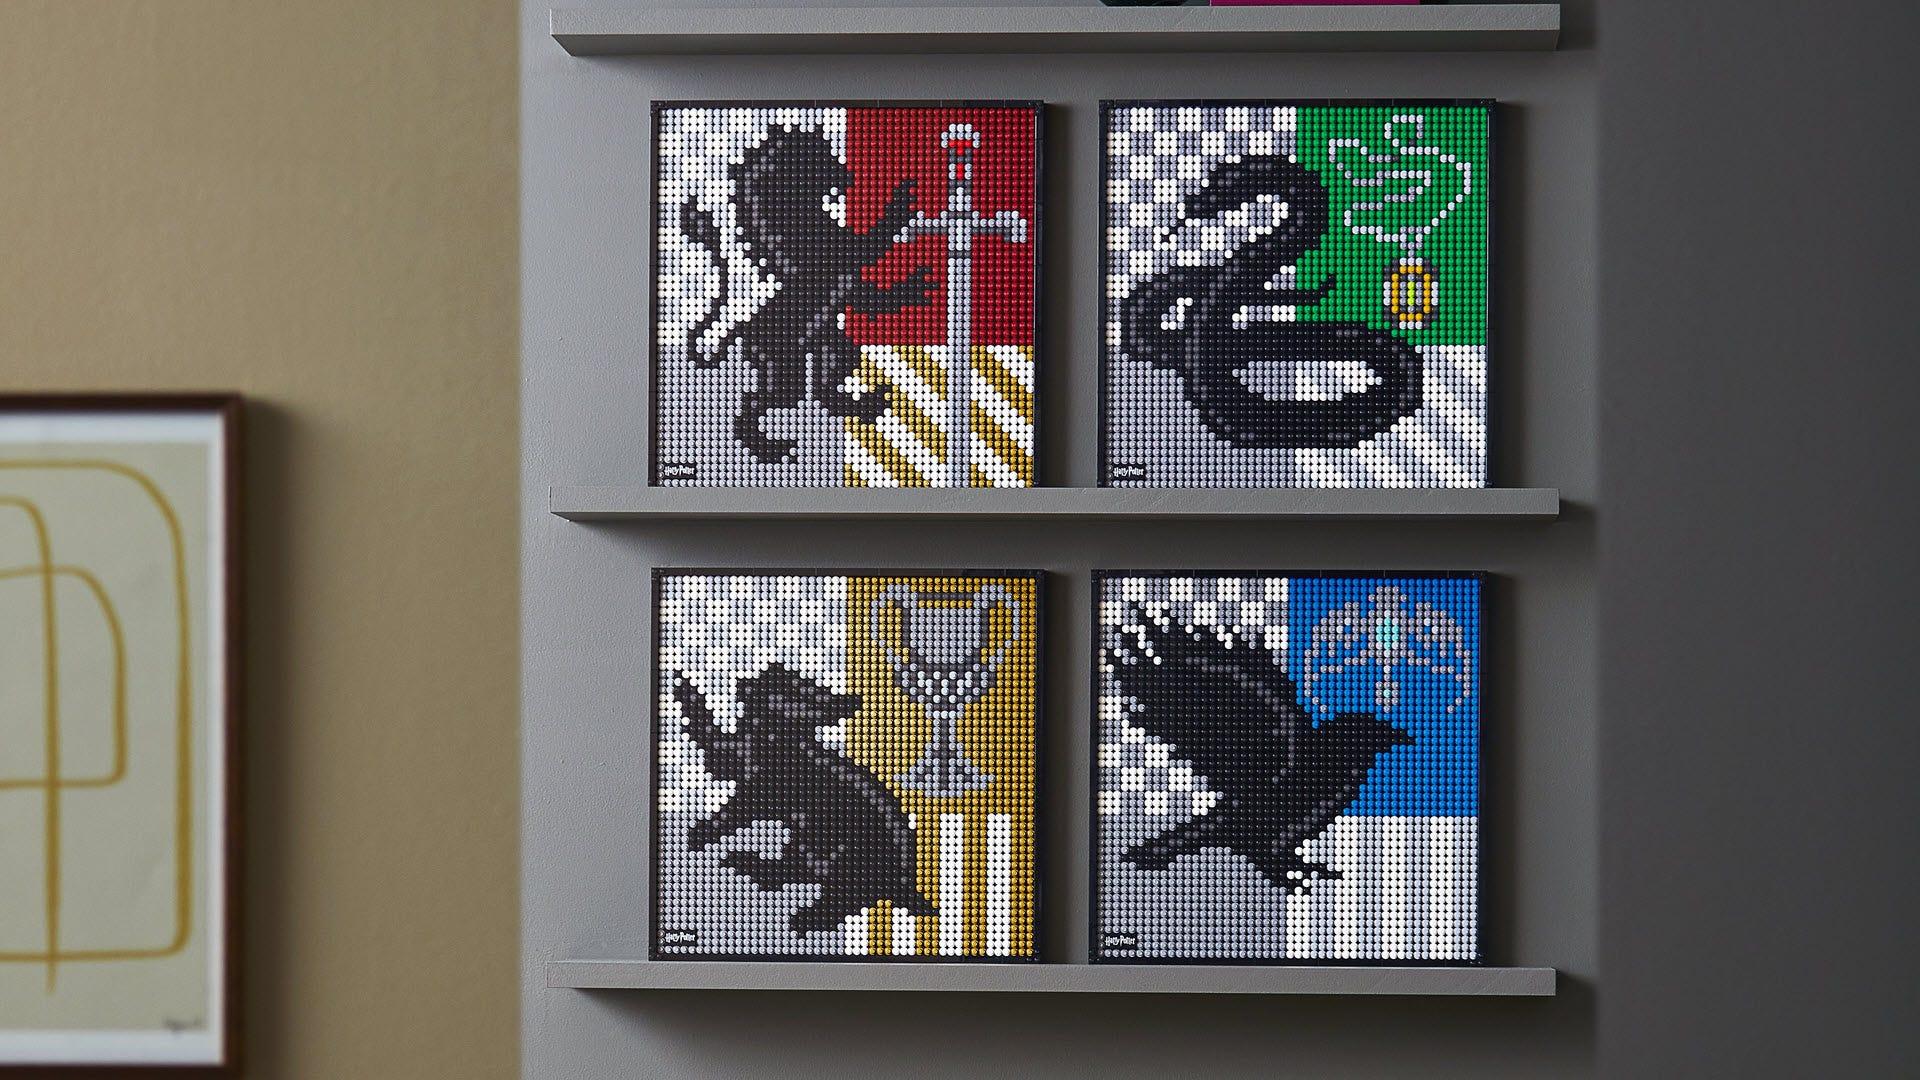 Four Hogwarts Crests side by side in LEGO form